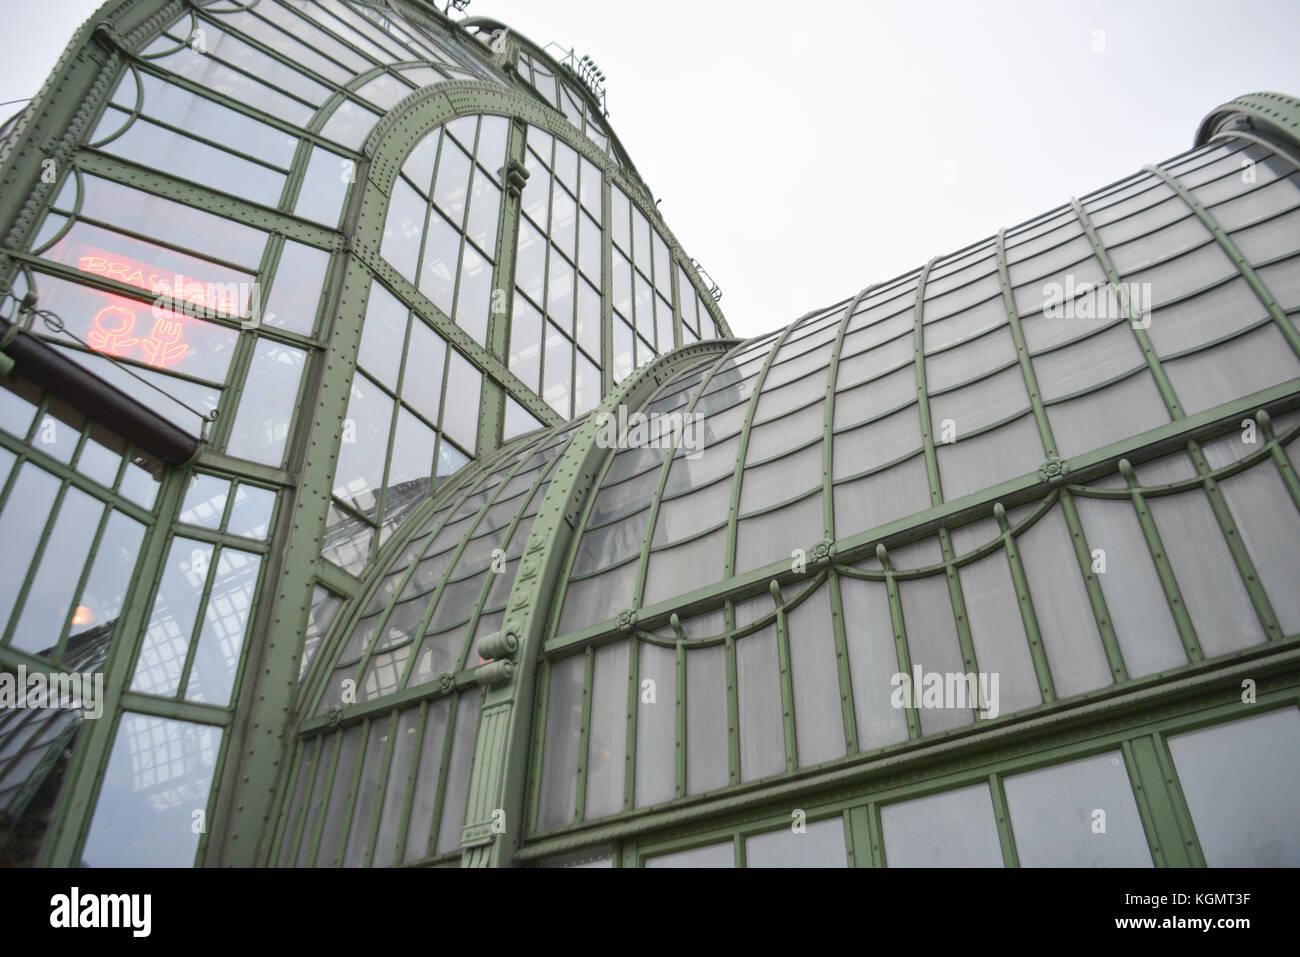 Elements of Grosse Orangerie, Vienna, Austria - Stock Image